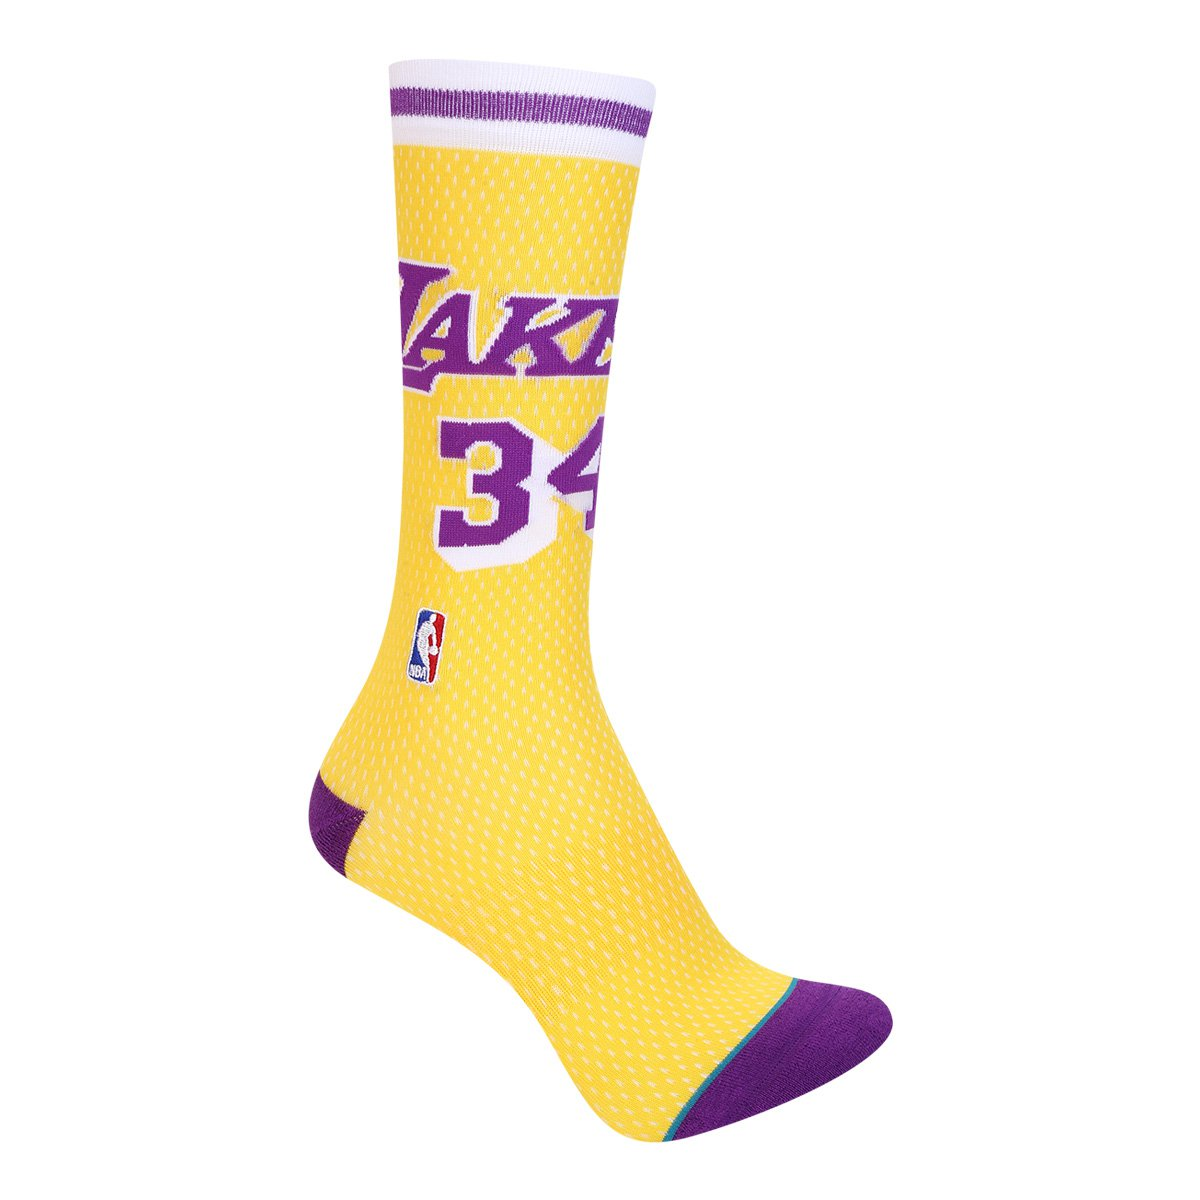 Foto 1 - Meia Stance Cano Alto NBA Los Angeles Lakers Shaq Hwc Jersey Masculina